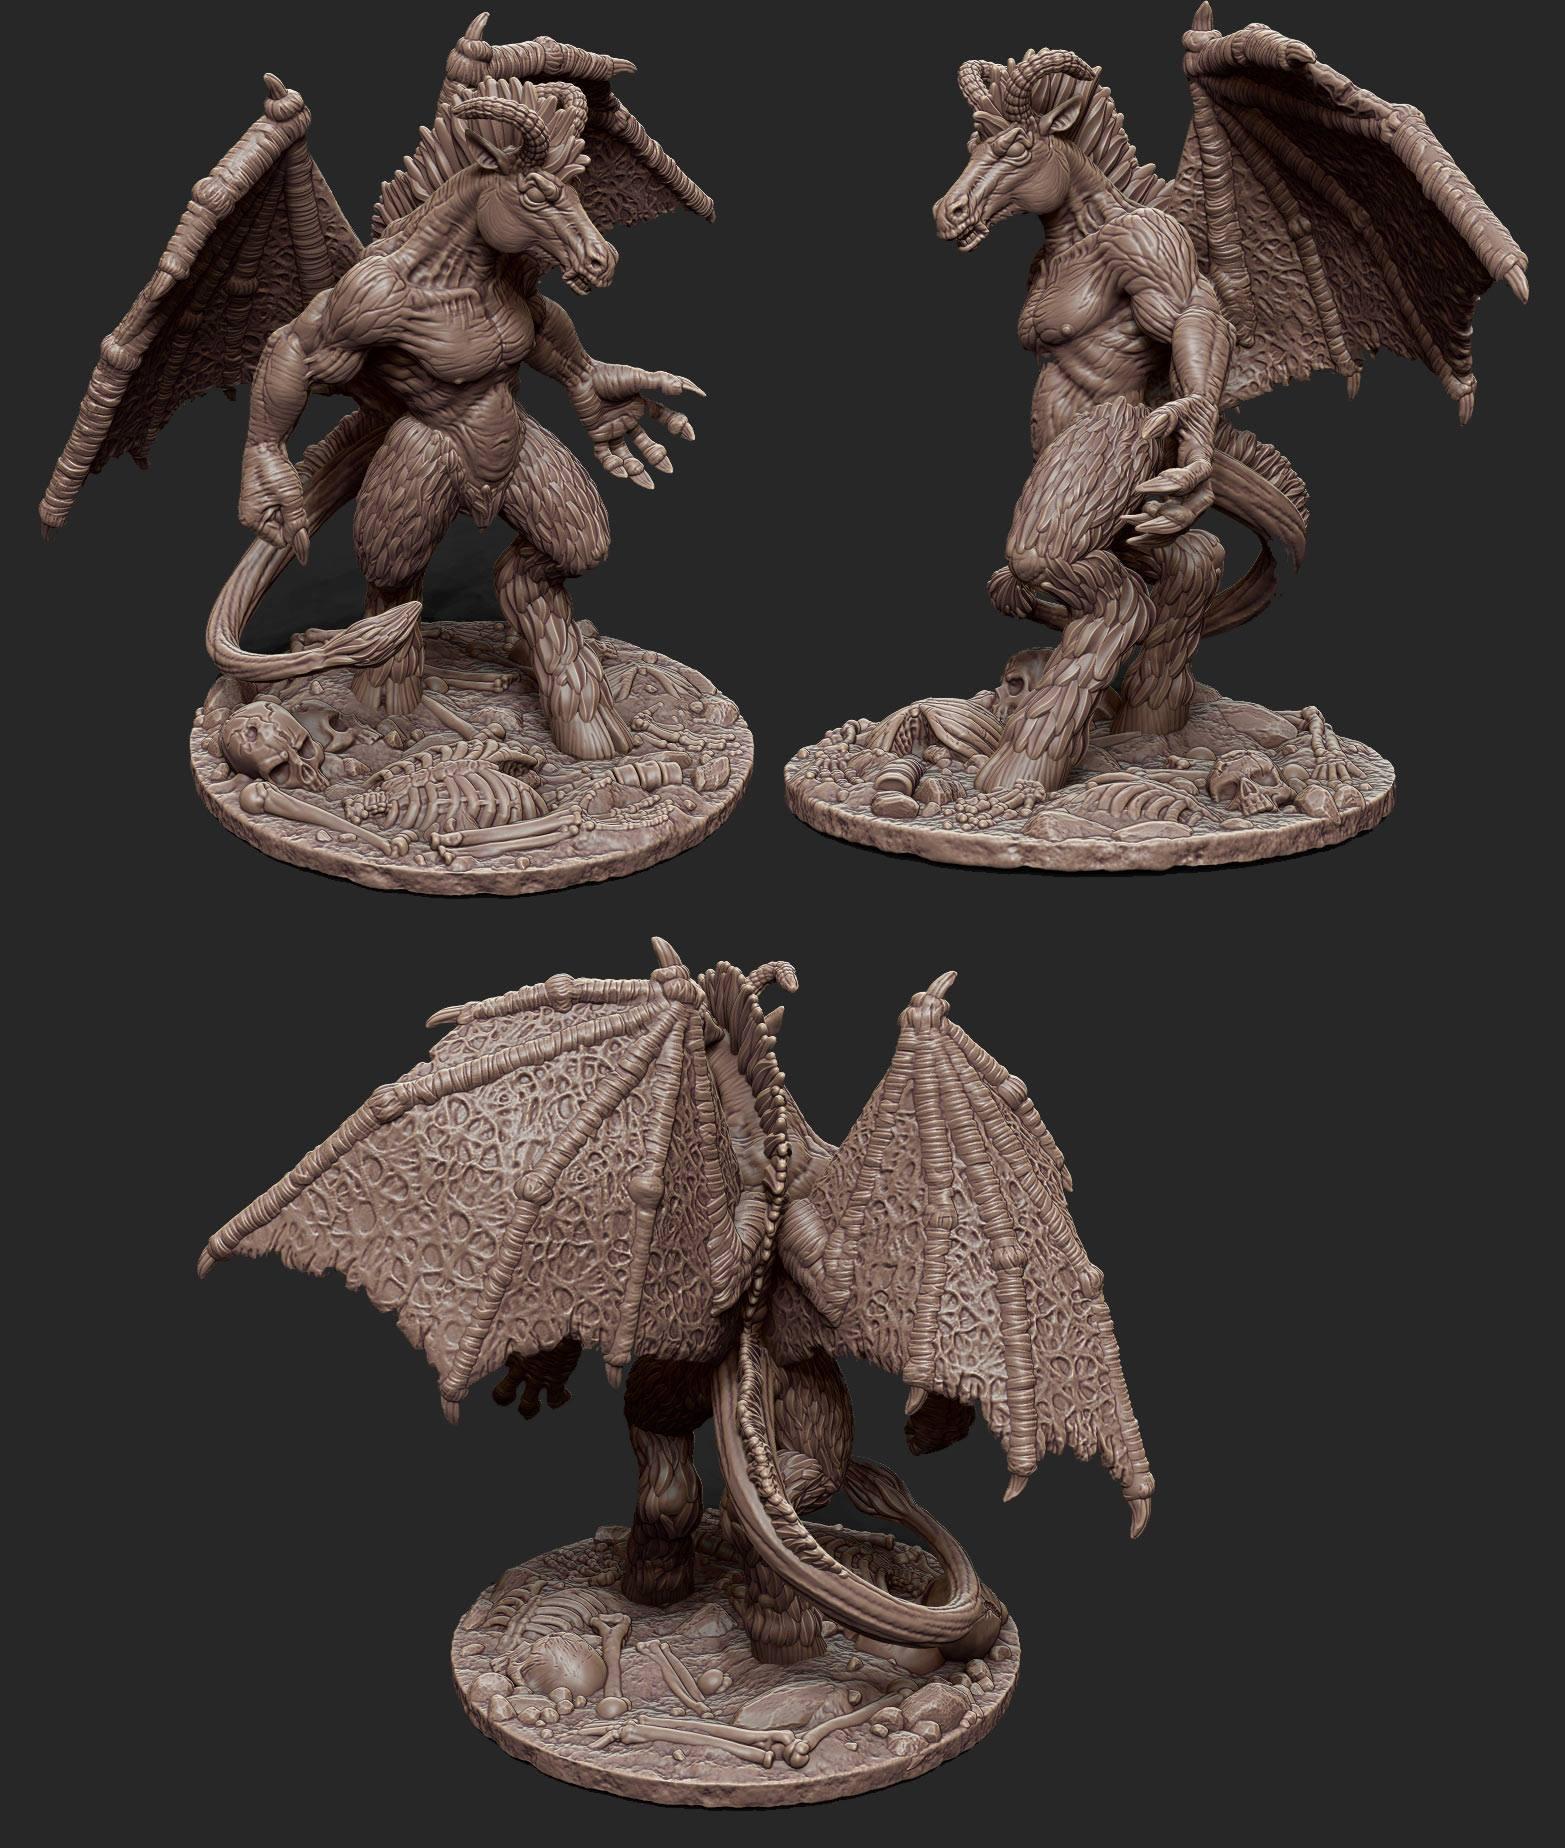 Jersey Devil Sculpt